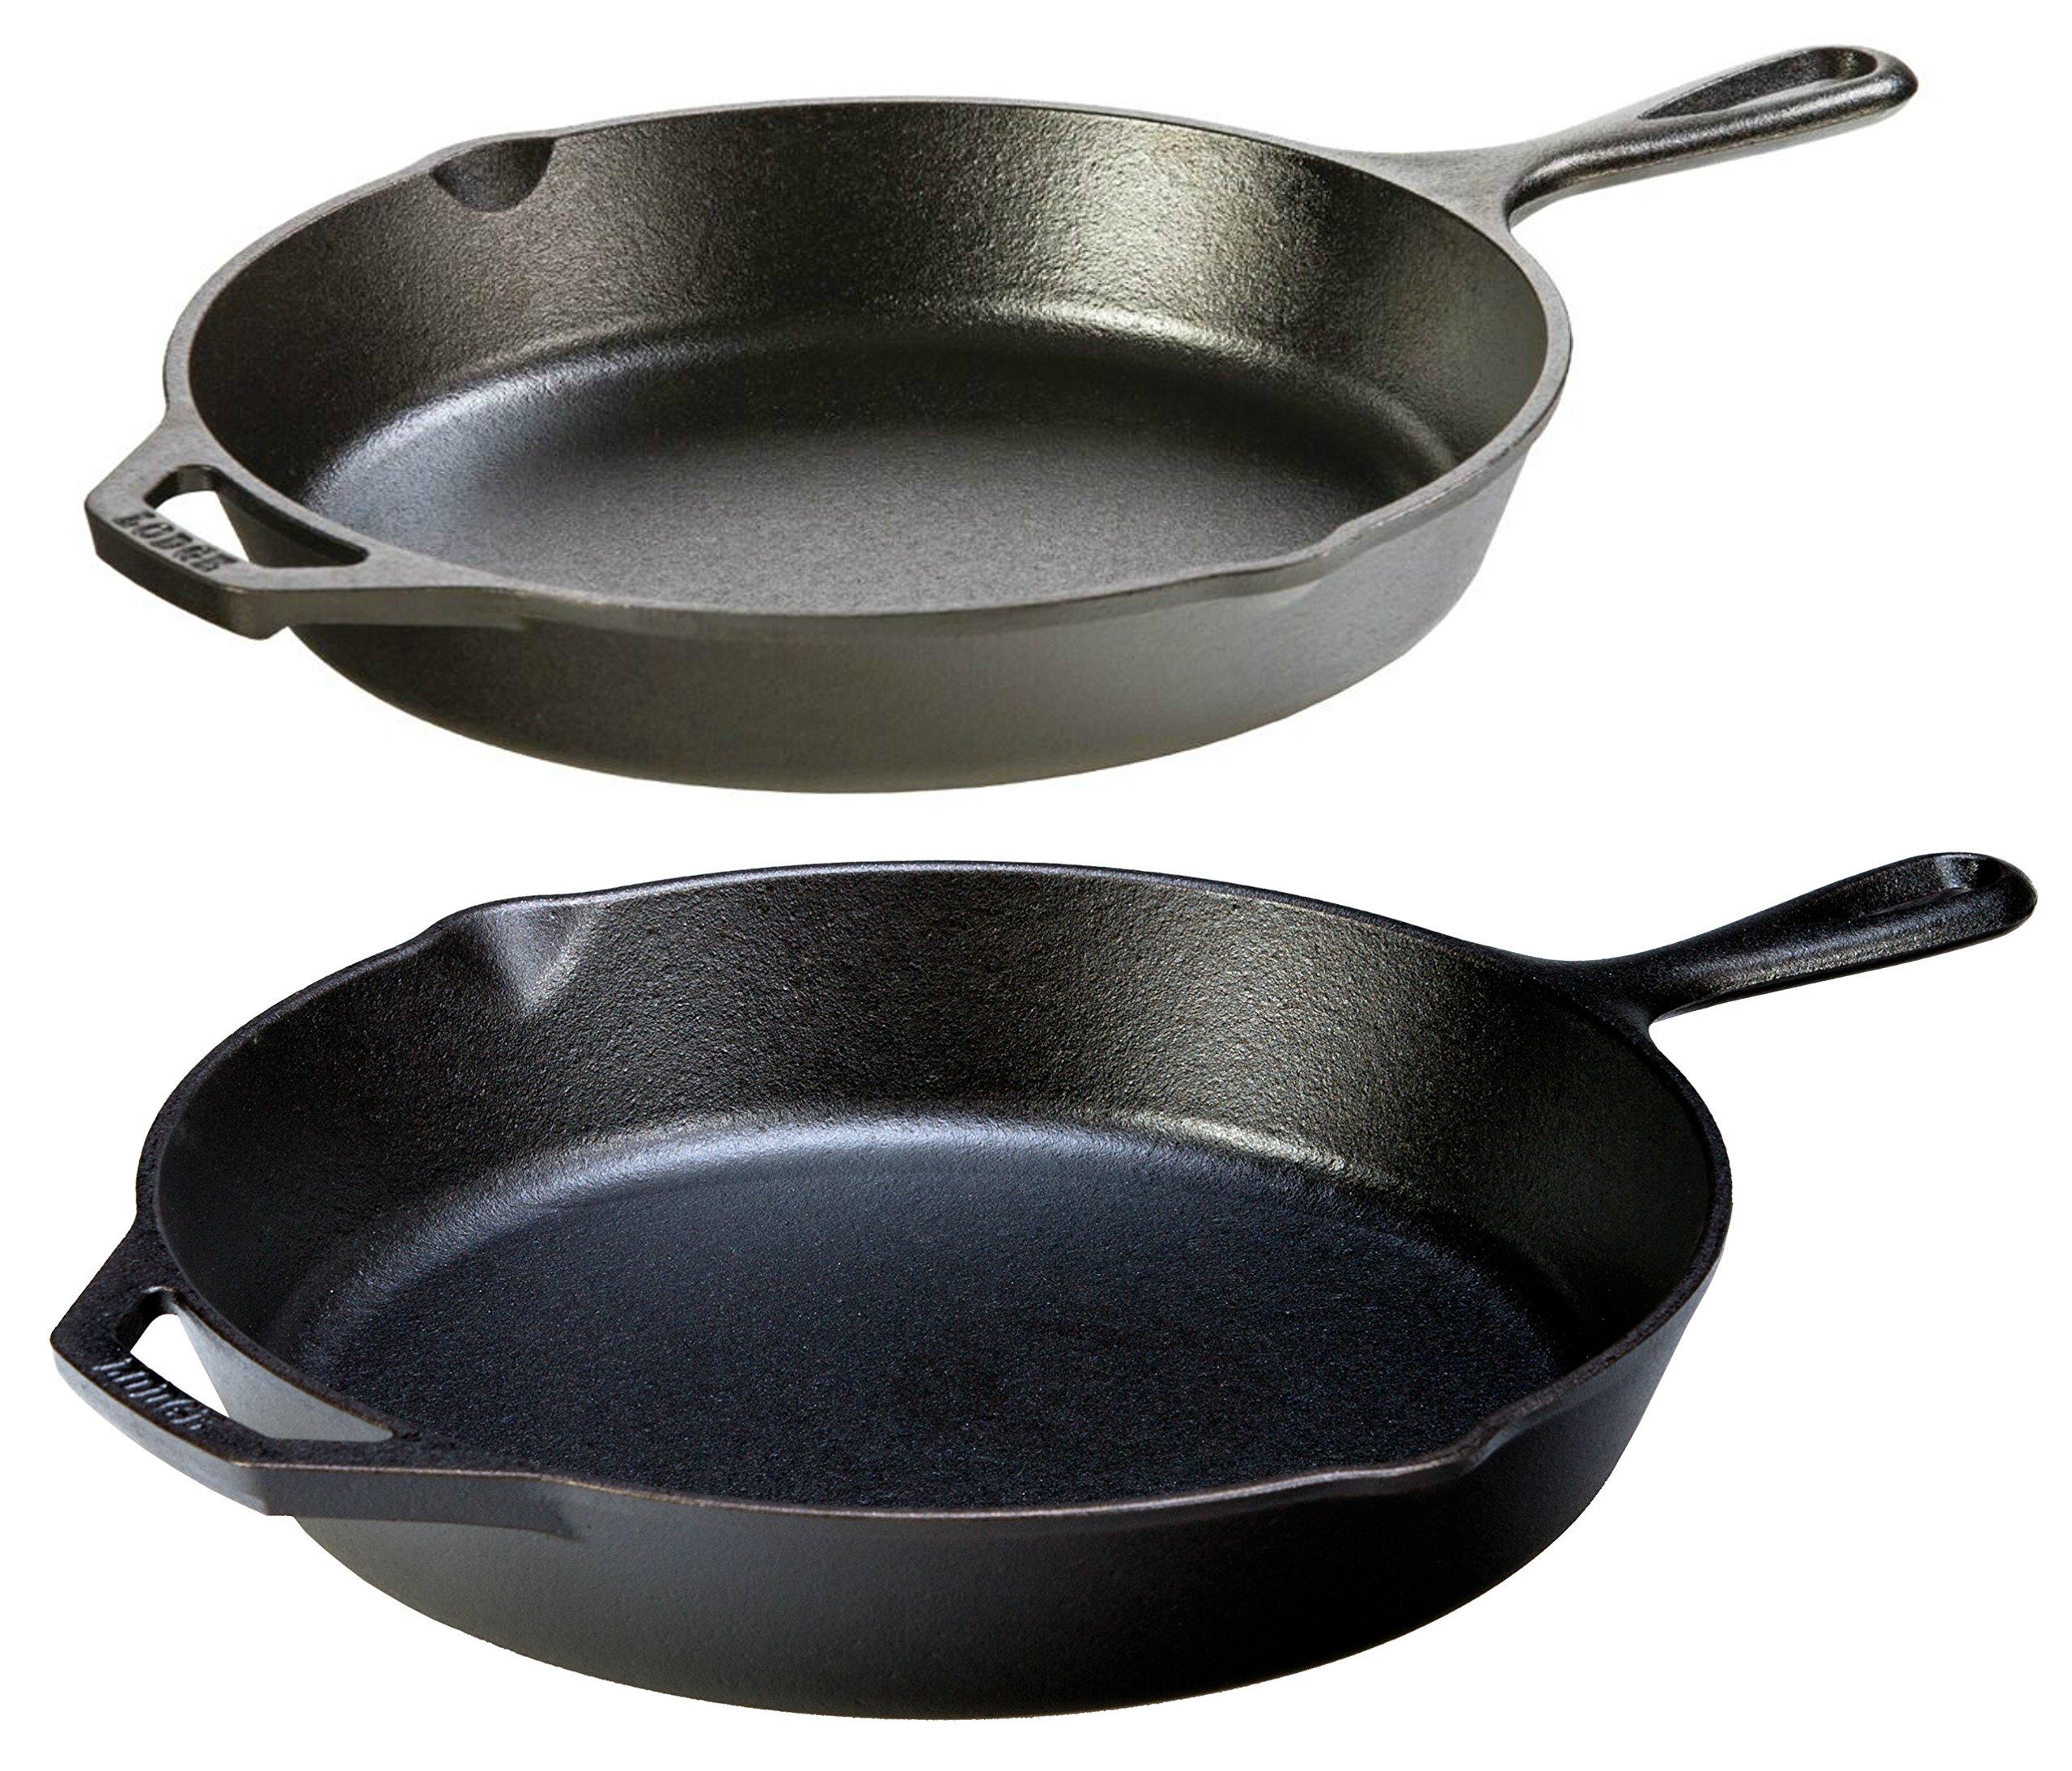 Lodge Seasoned Cast Iron 2 Skillet Bundle. 12'' + 10.25'' Set of 2 Cast Iron Frying Pans by Lodge (Image #1)